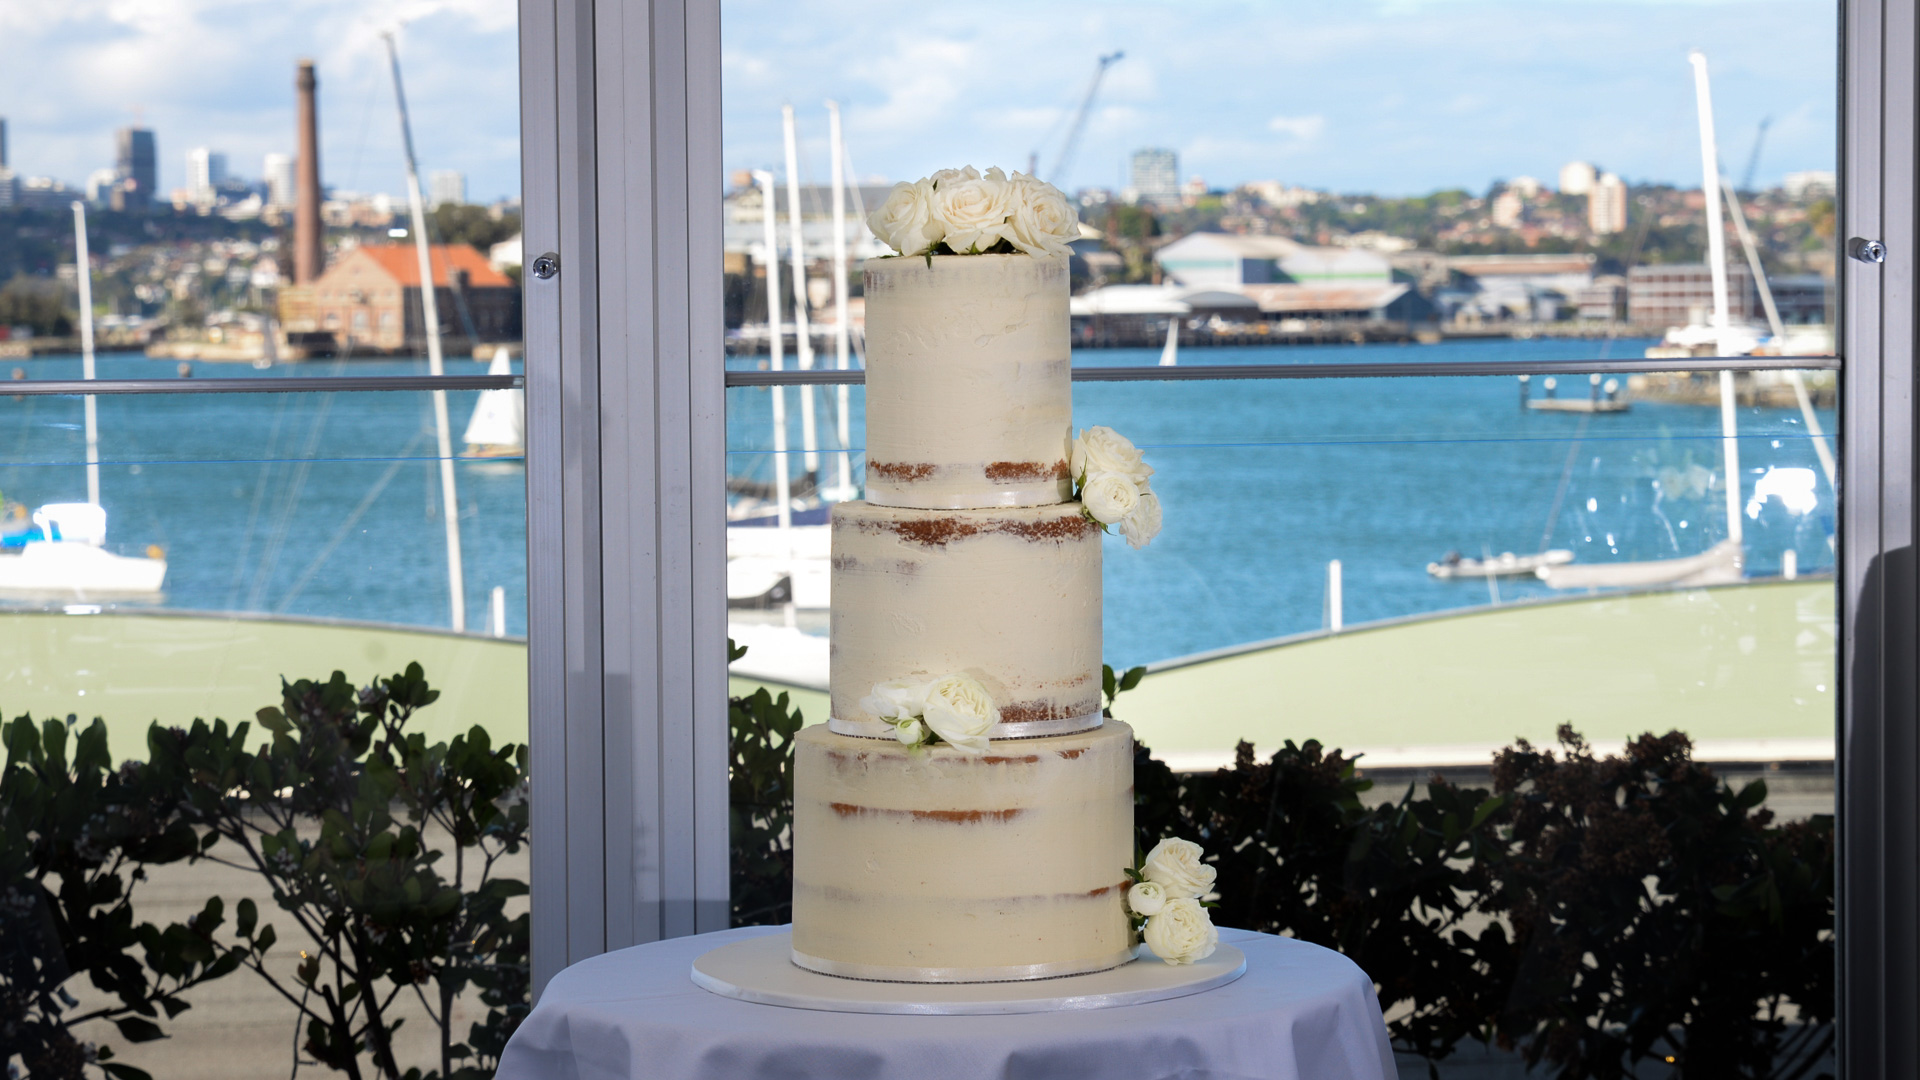 Semi-Scraped-Naked-Wedding-Cake.jpg